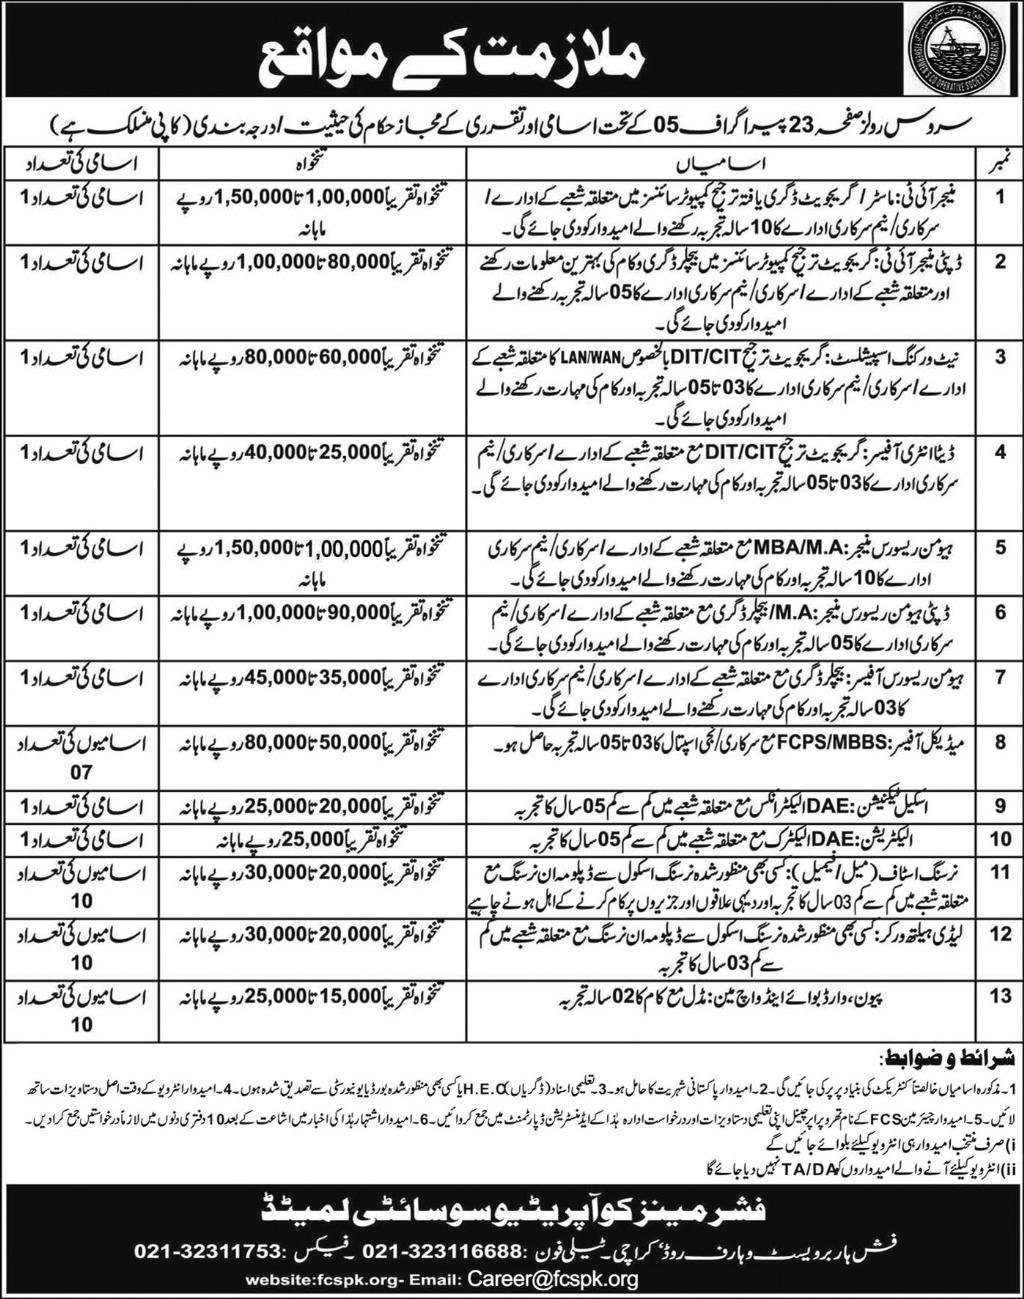 Fishermen Cooperative Societies Limited Jobs  In Karachi For